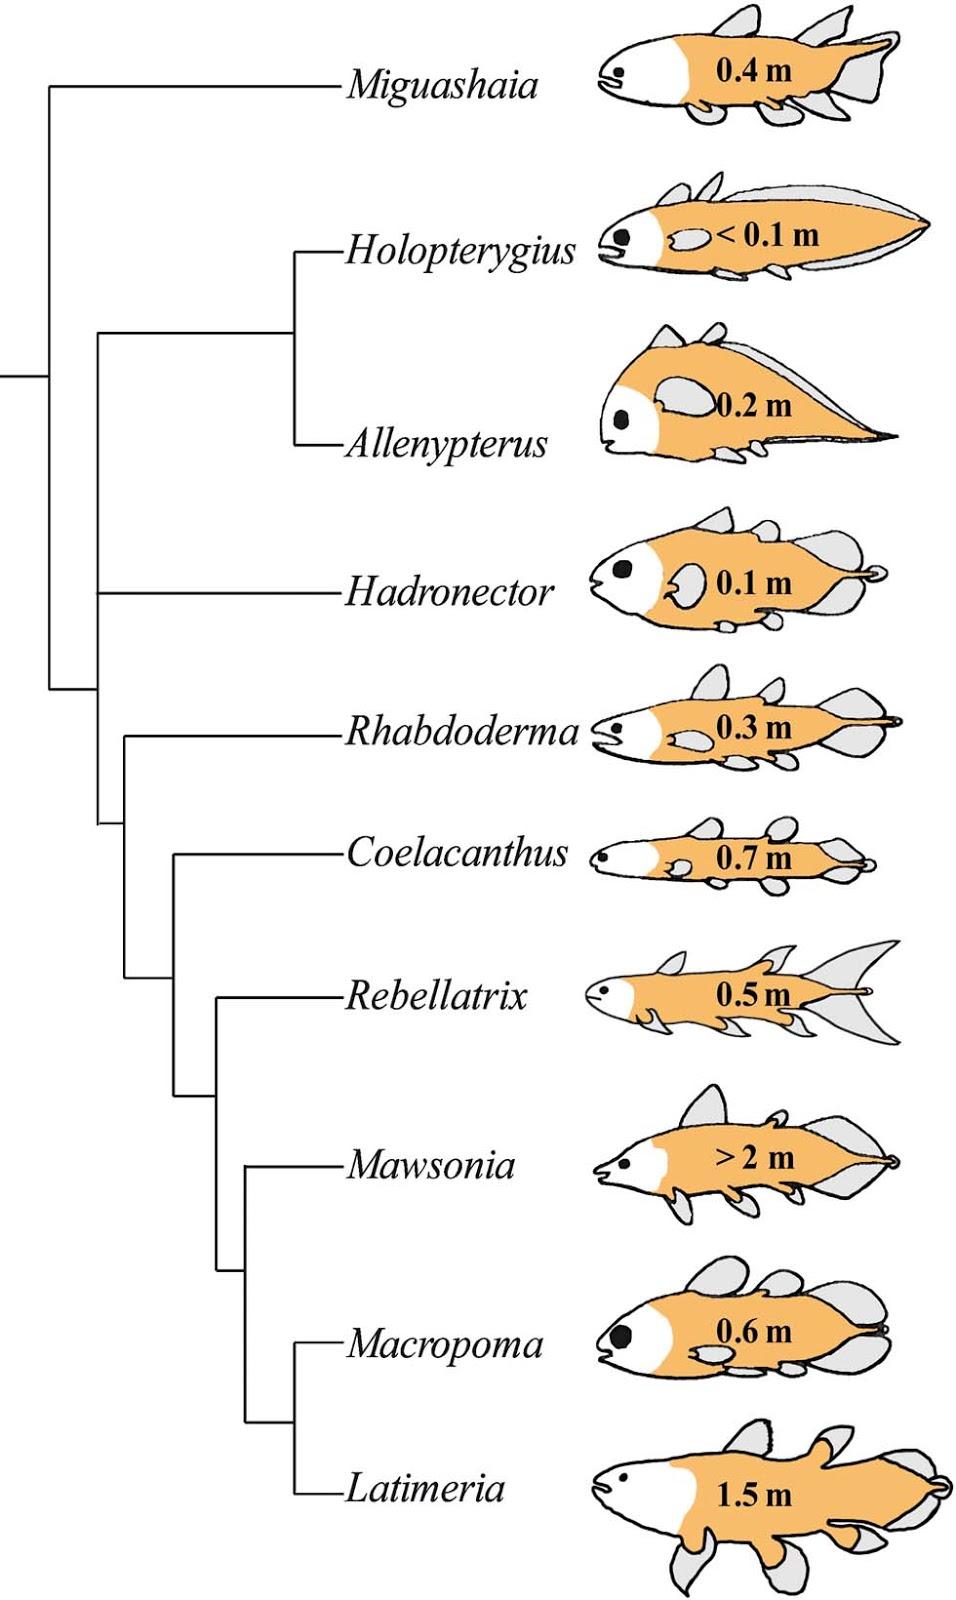 bio essays ap bio evolution essay questions munch et al bioessays  bio essays bio essays bio essays bioessays microbiome